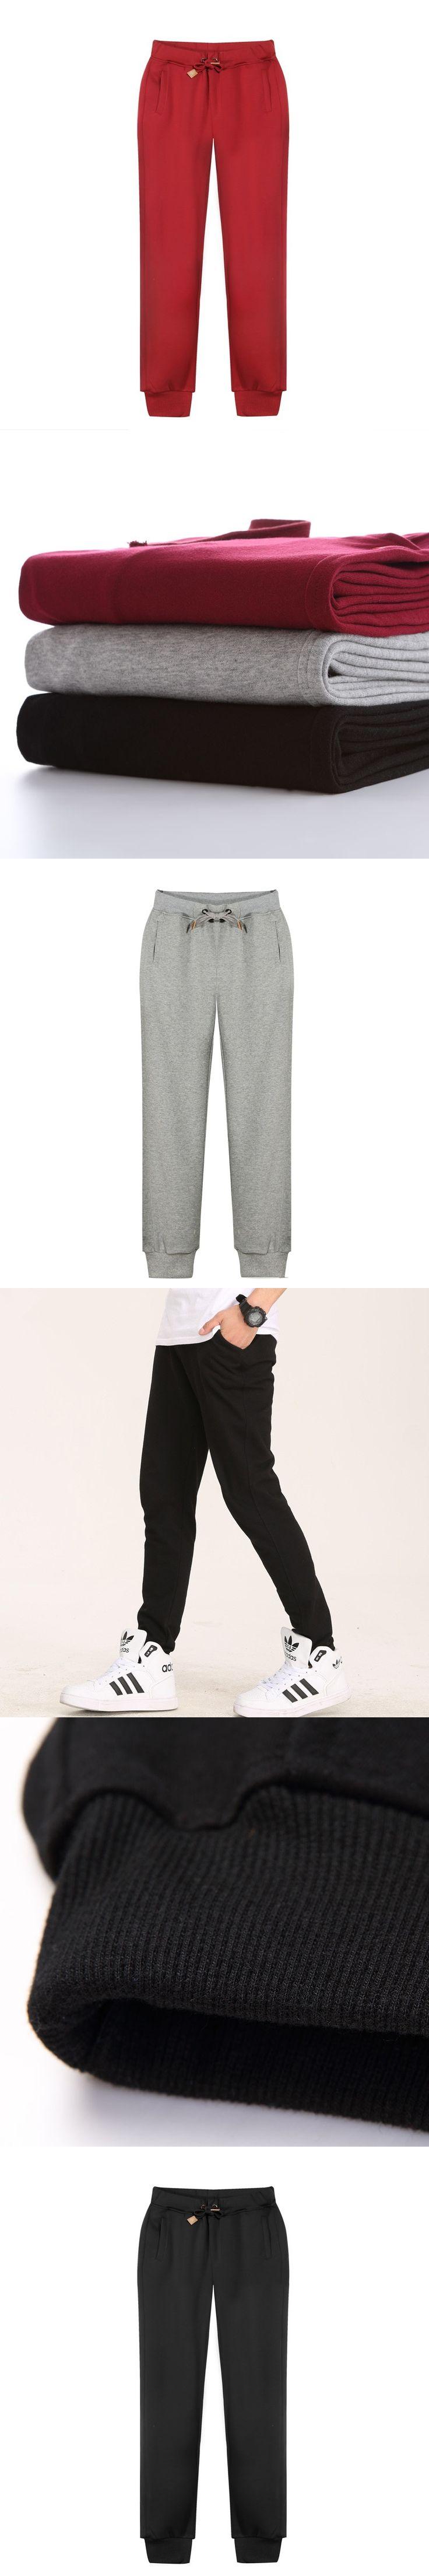 Mens Joggers 2017 Brand Male Trousers Men Pants Casual Sweatpants Jogger Black XXXL homme skinny trousers Workout Pants for Men